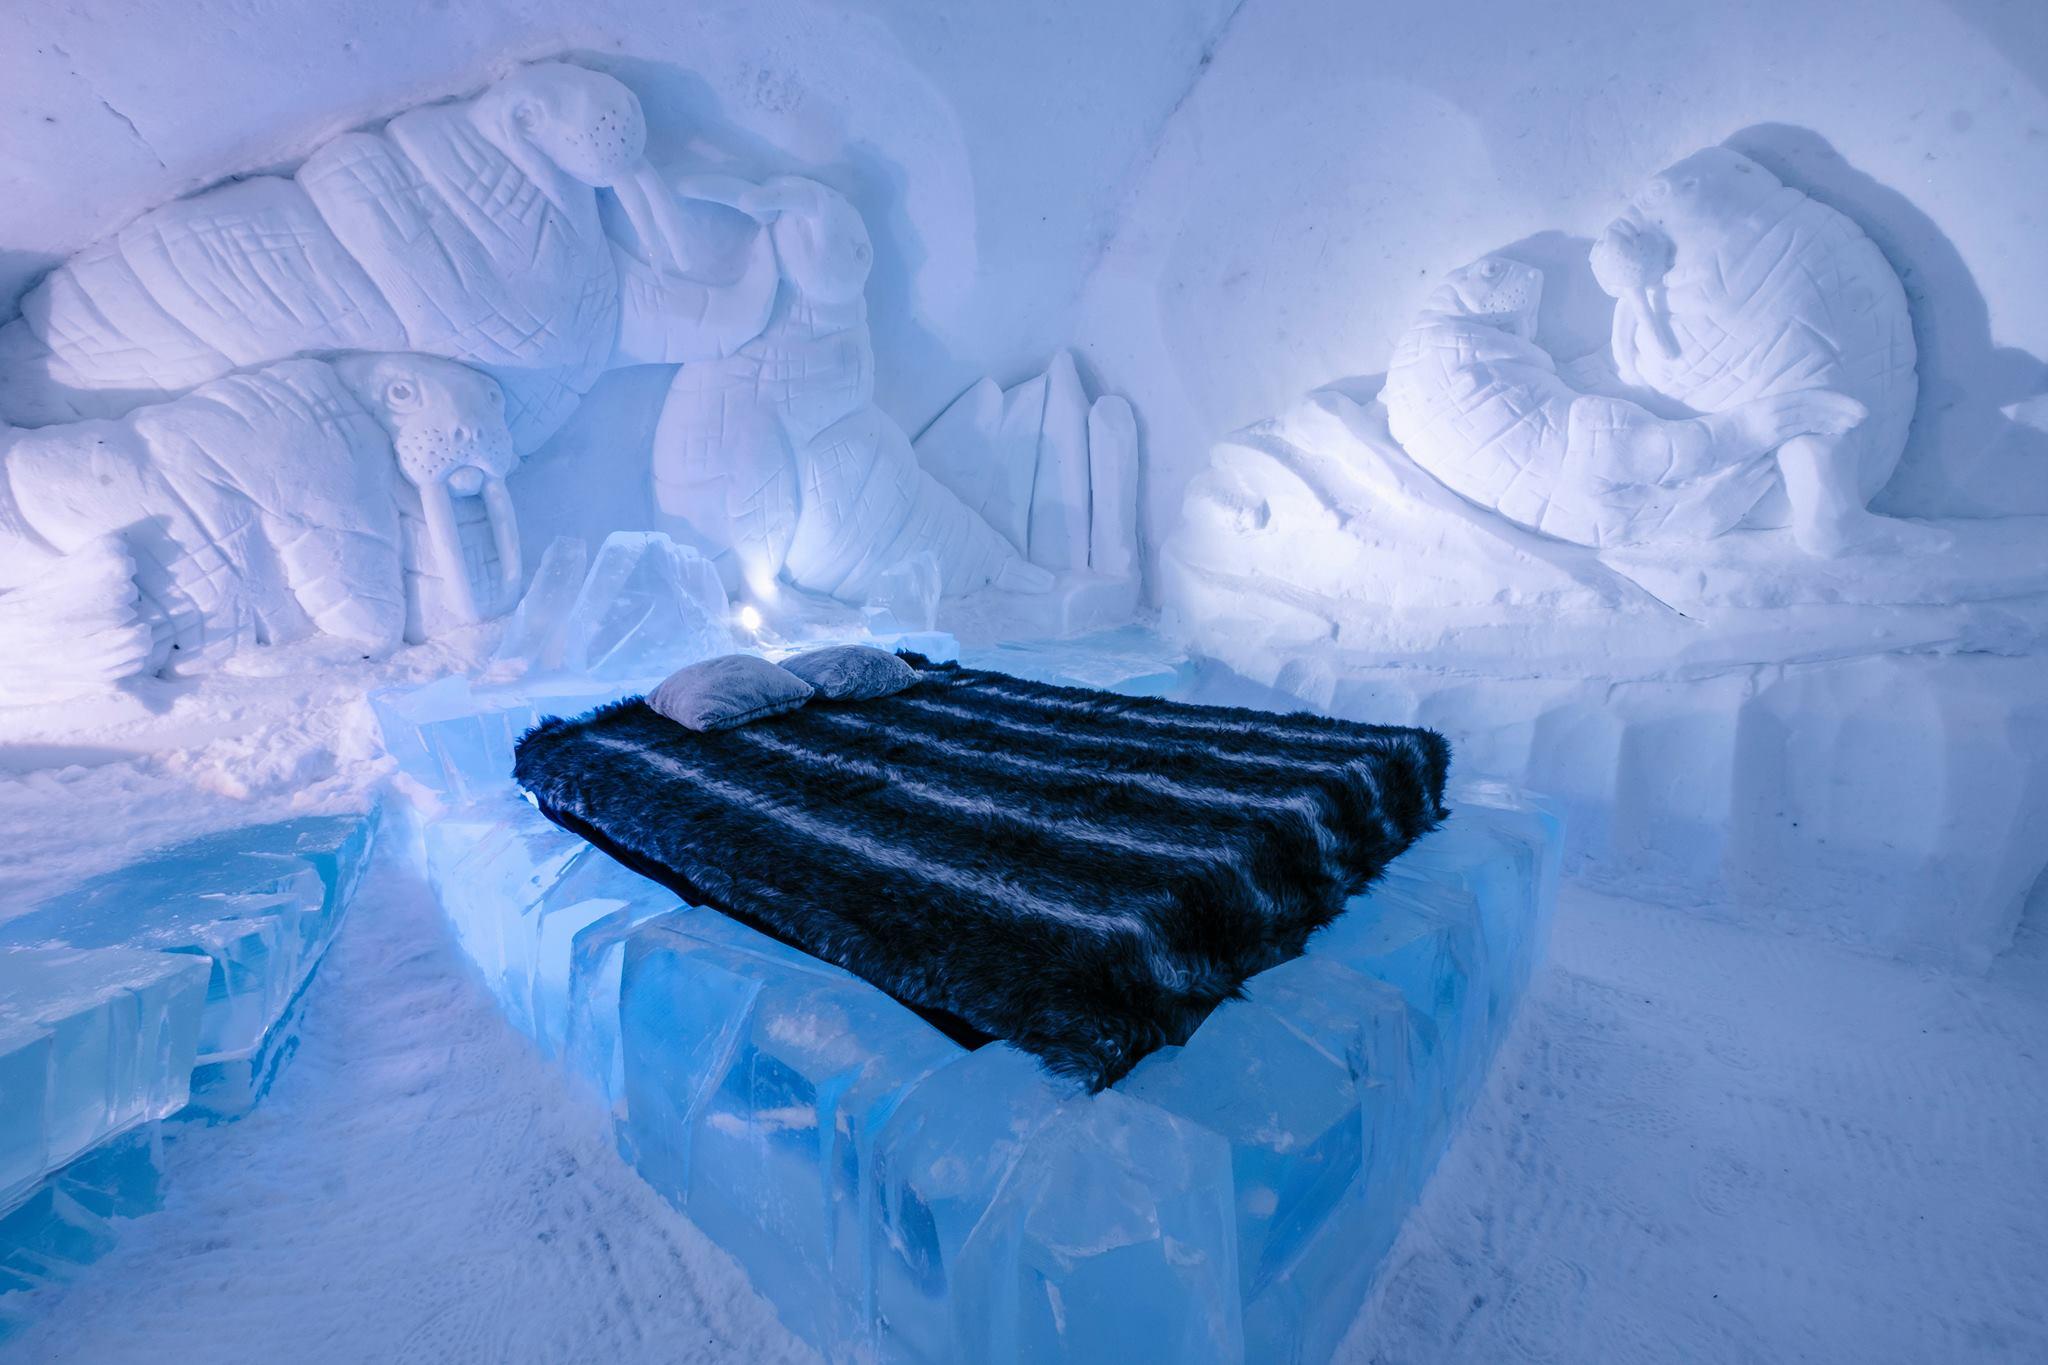 hotel de glace canada virtual tour